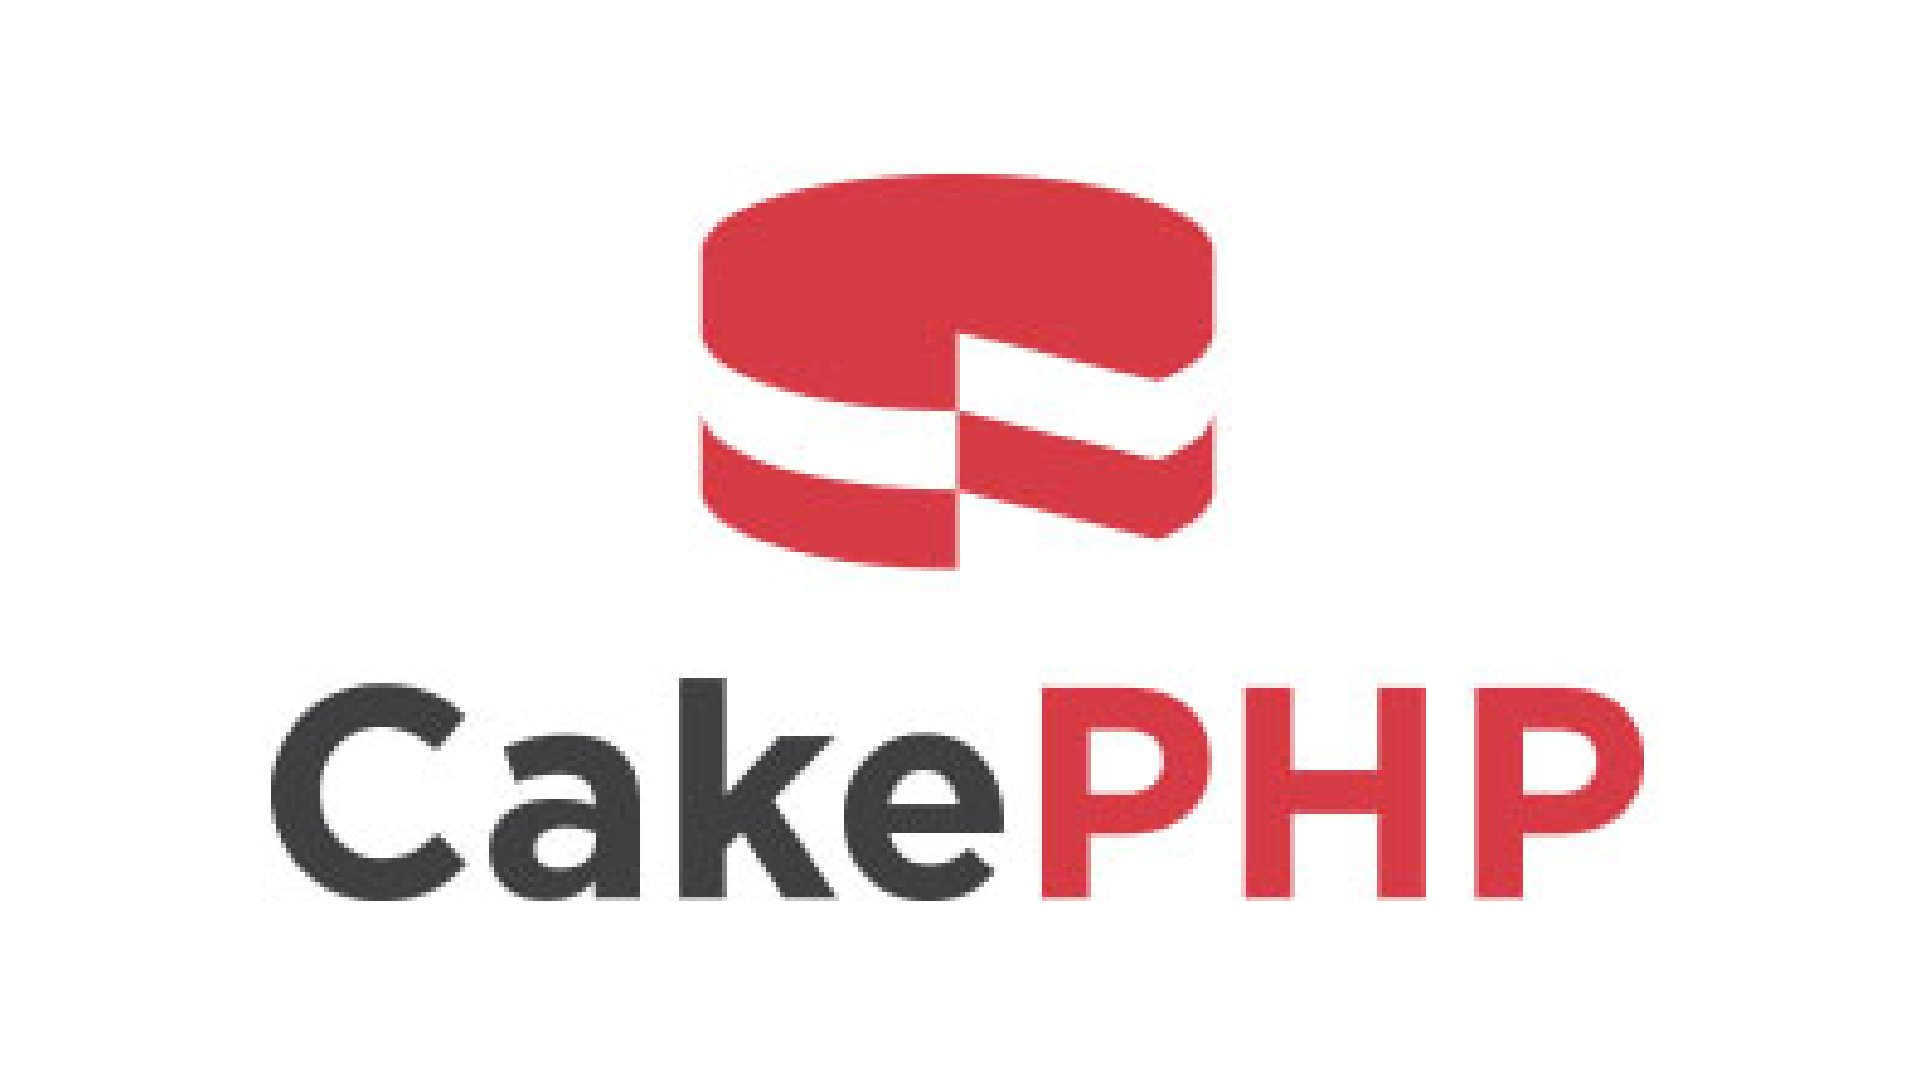 CakePHP logo.